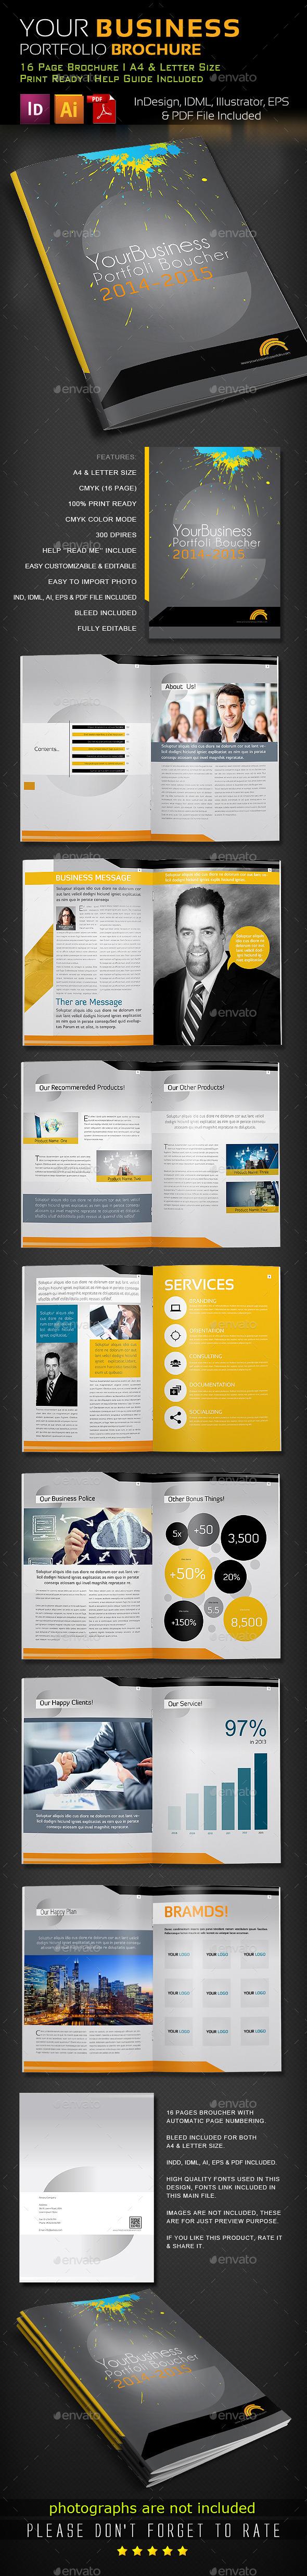 GraphicRiver Corporate Business Brochure 8795673